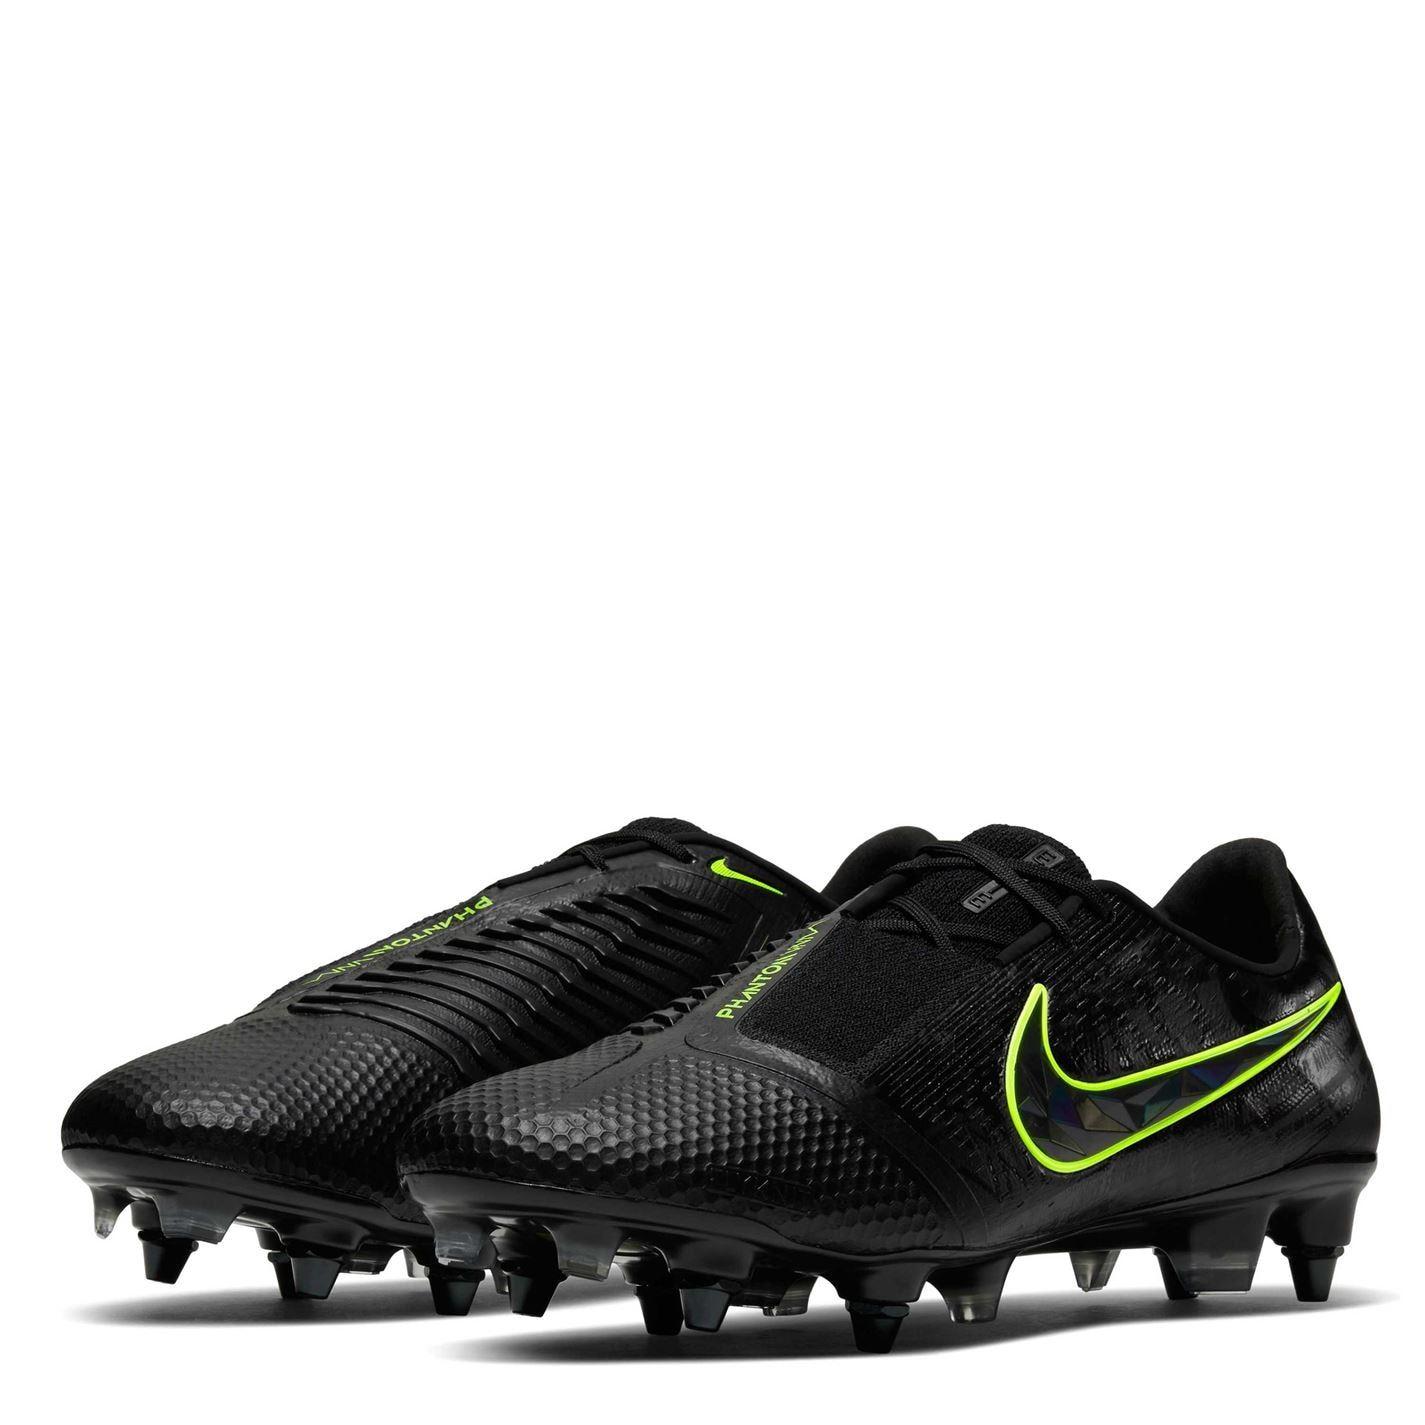 Nike-Phantom-Venom-Elite-Homme-SG-Terrain-Souple-Chaussures-De-Football-Chaussures-de-foot-crampons miniature 12